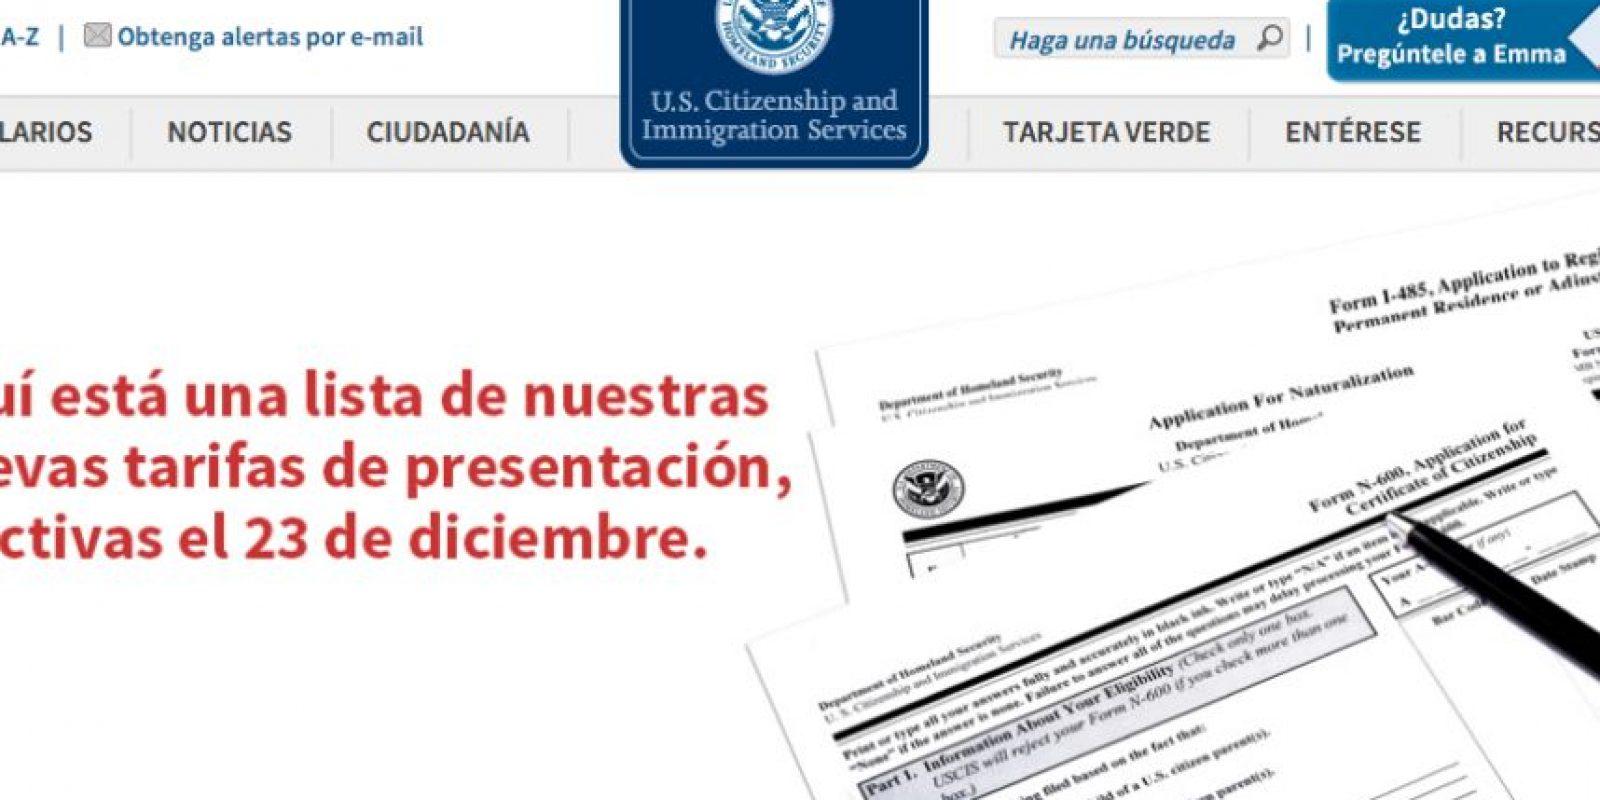 Foto:Uscis.gov